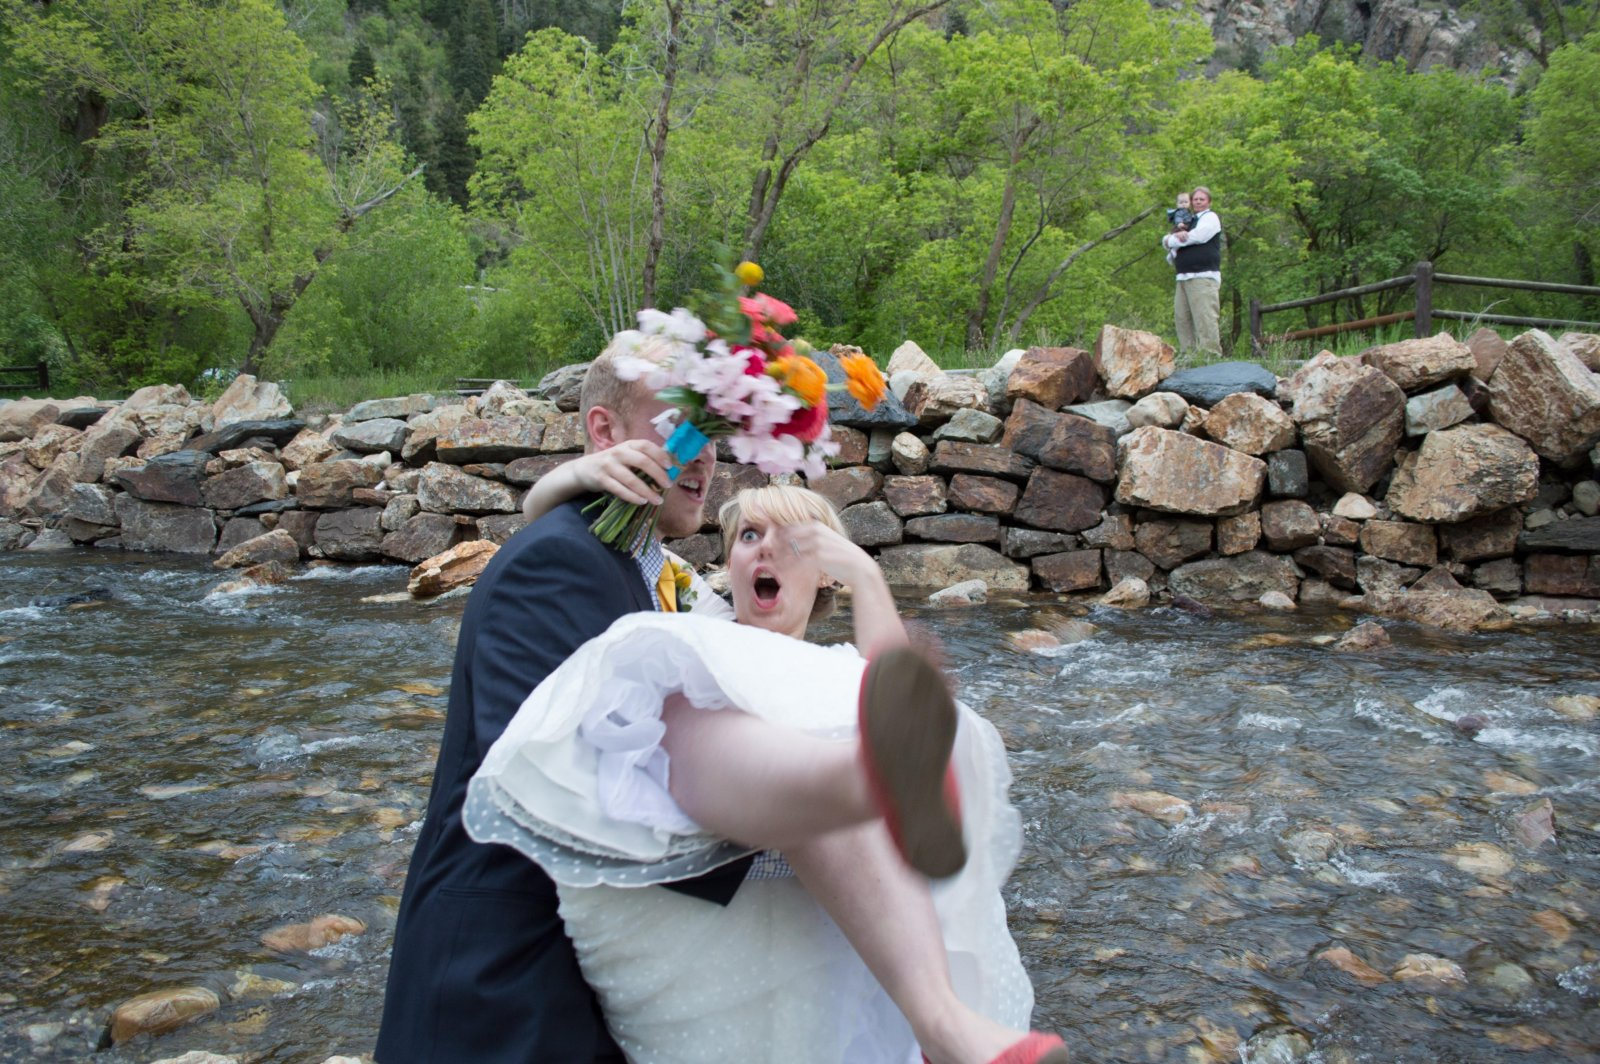 жених не удержал невесту на руках